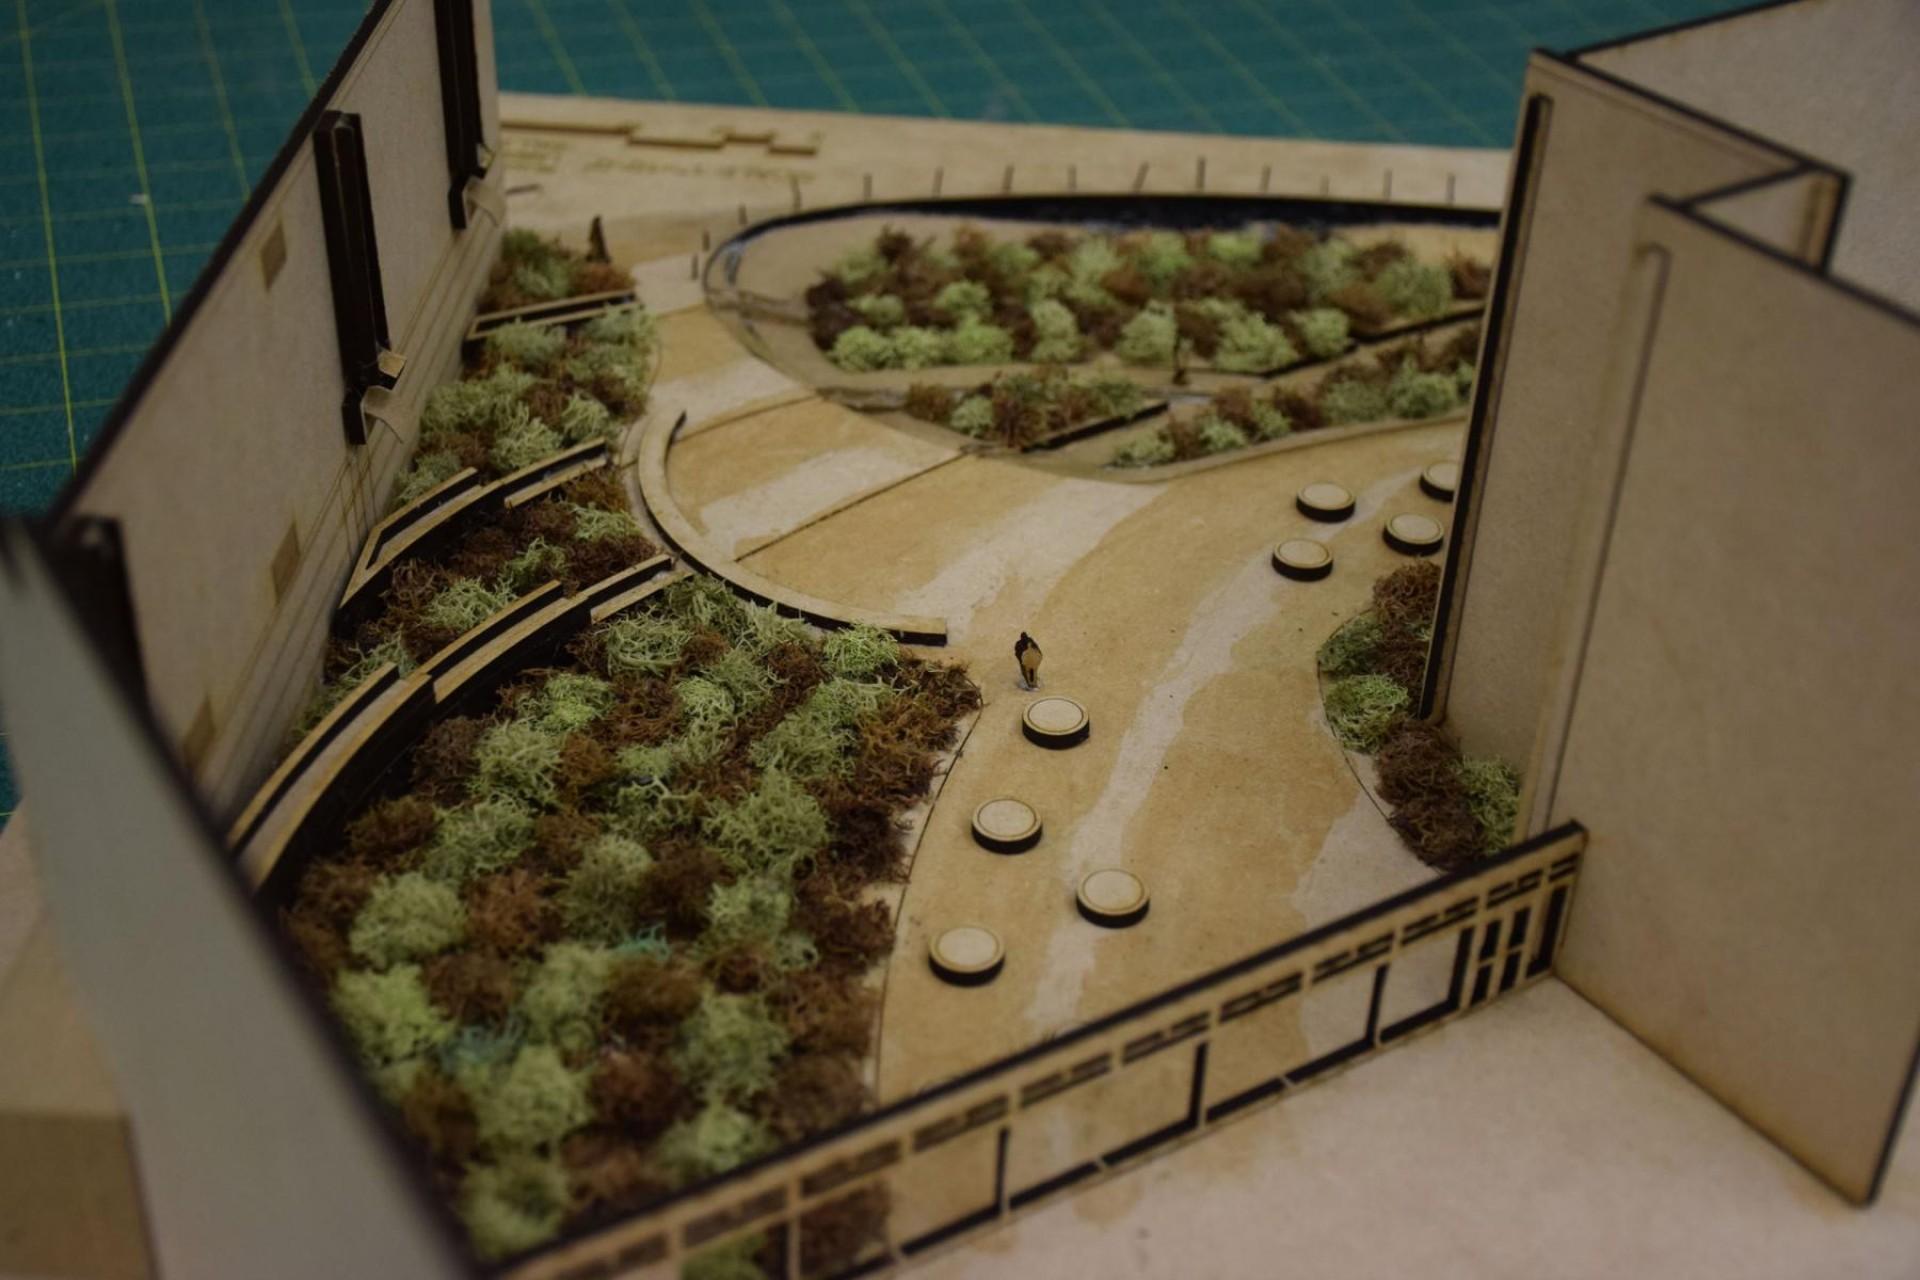 023 Ni Artful Rainwater Design Larch 211 F14 Webitokdyjp8sbg Landscape Architecture Essay Stunning Argumentative Topics 1920